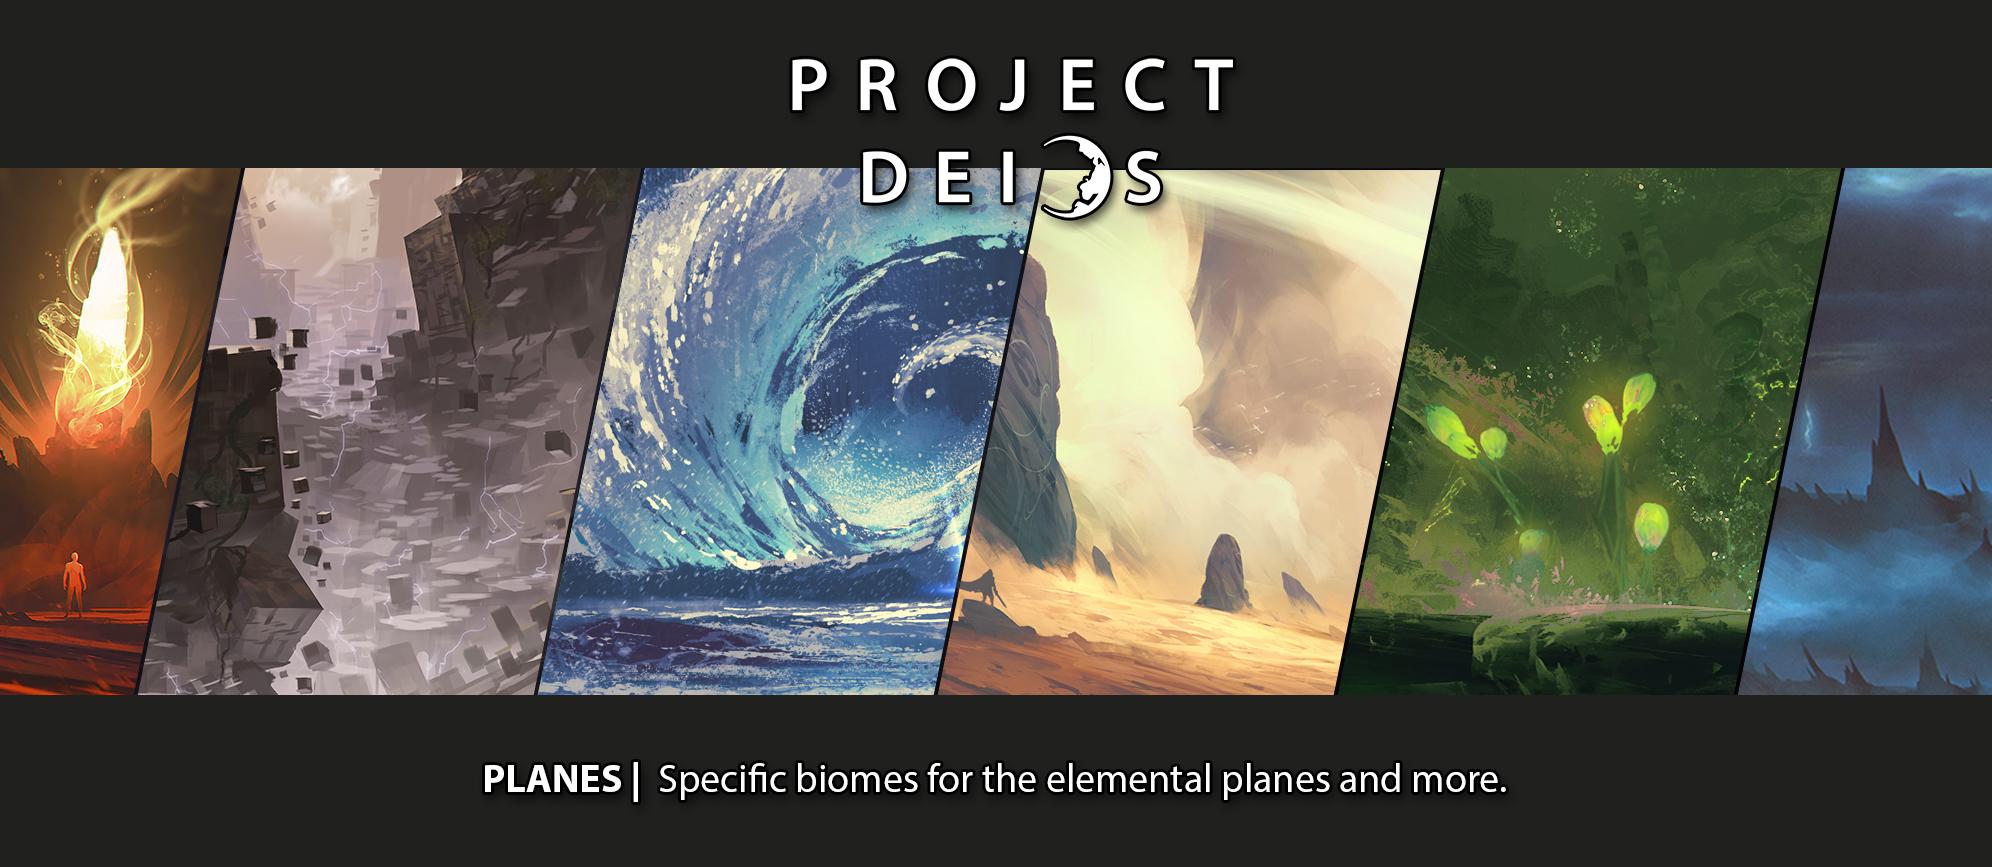 Credit - Project Deios,  Ishutan i, and  Shahab Alizadeh